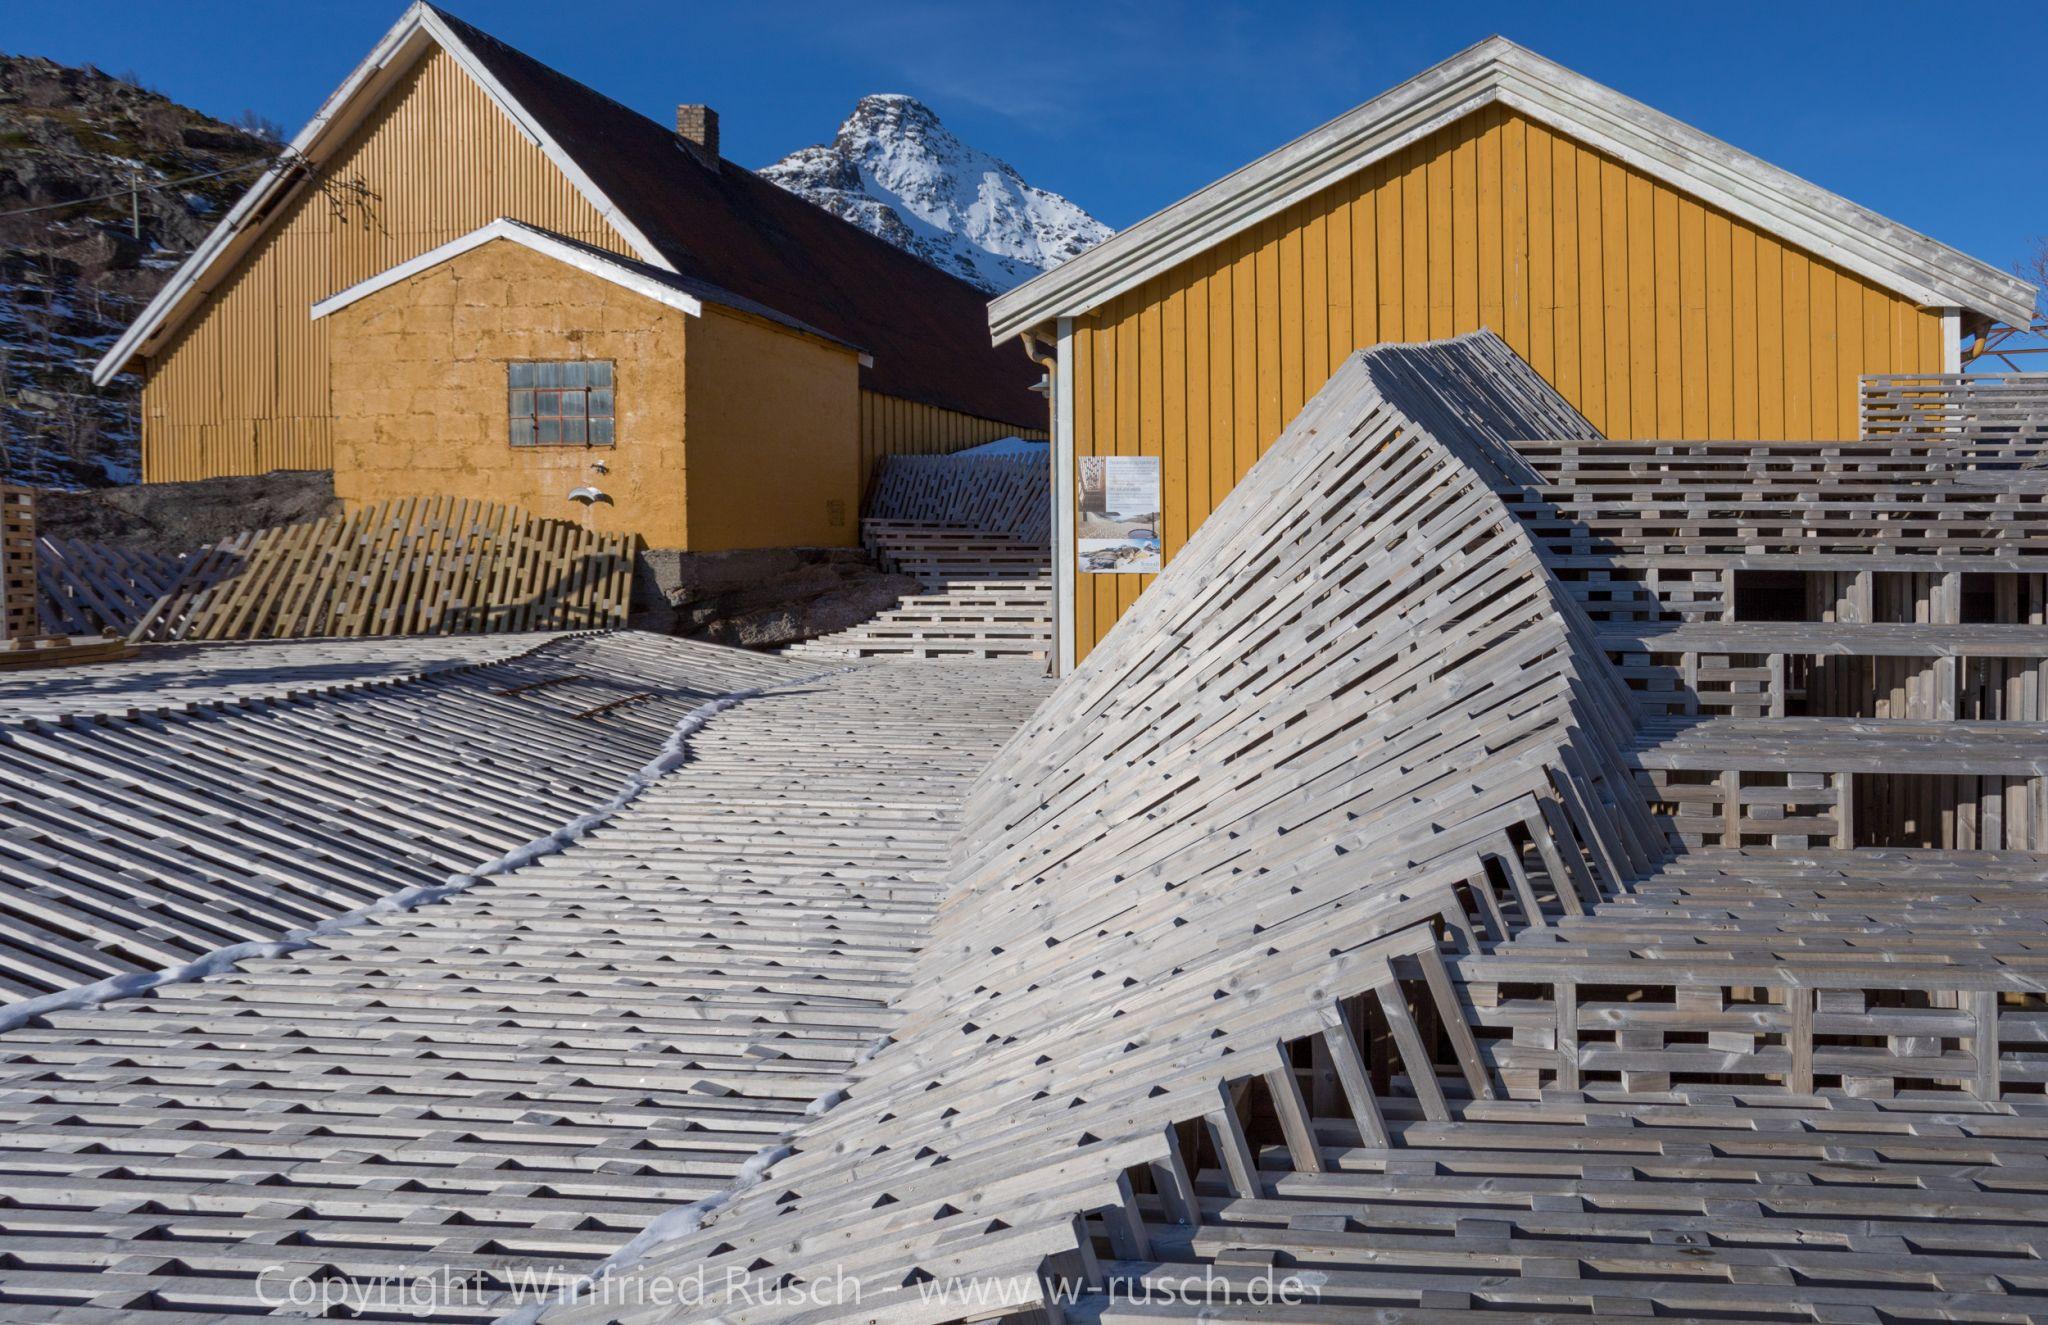 Badeplattform in Nusfjord, Norway